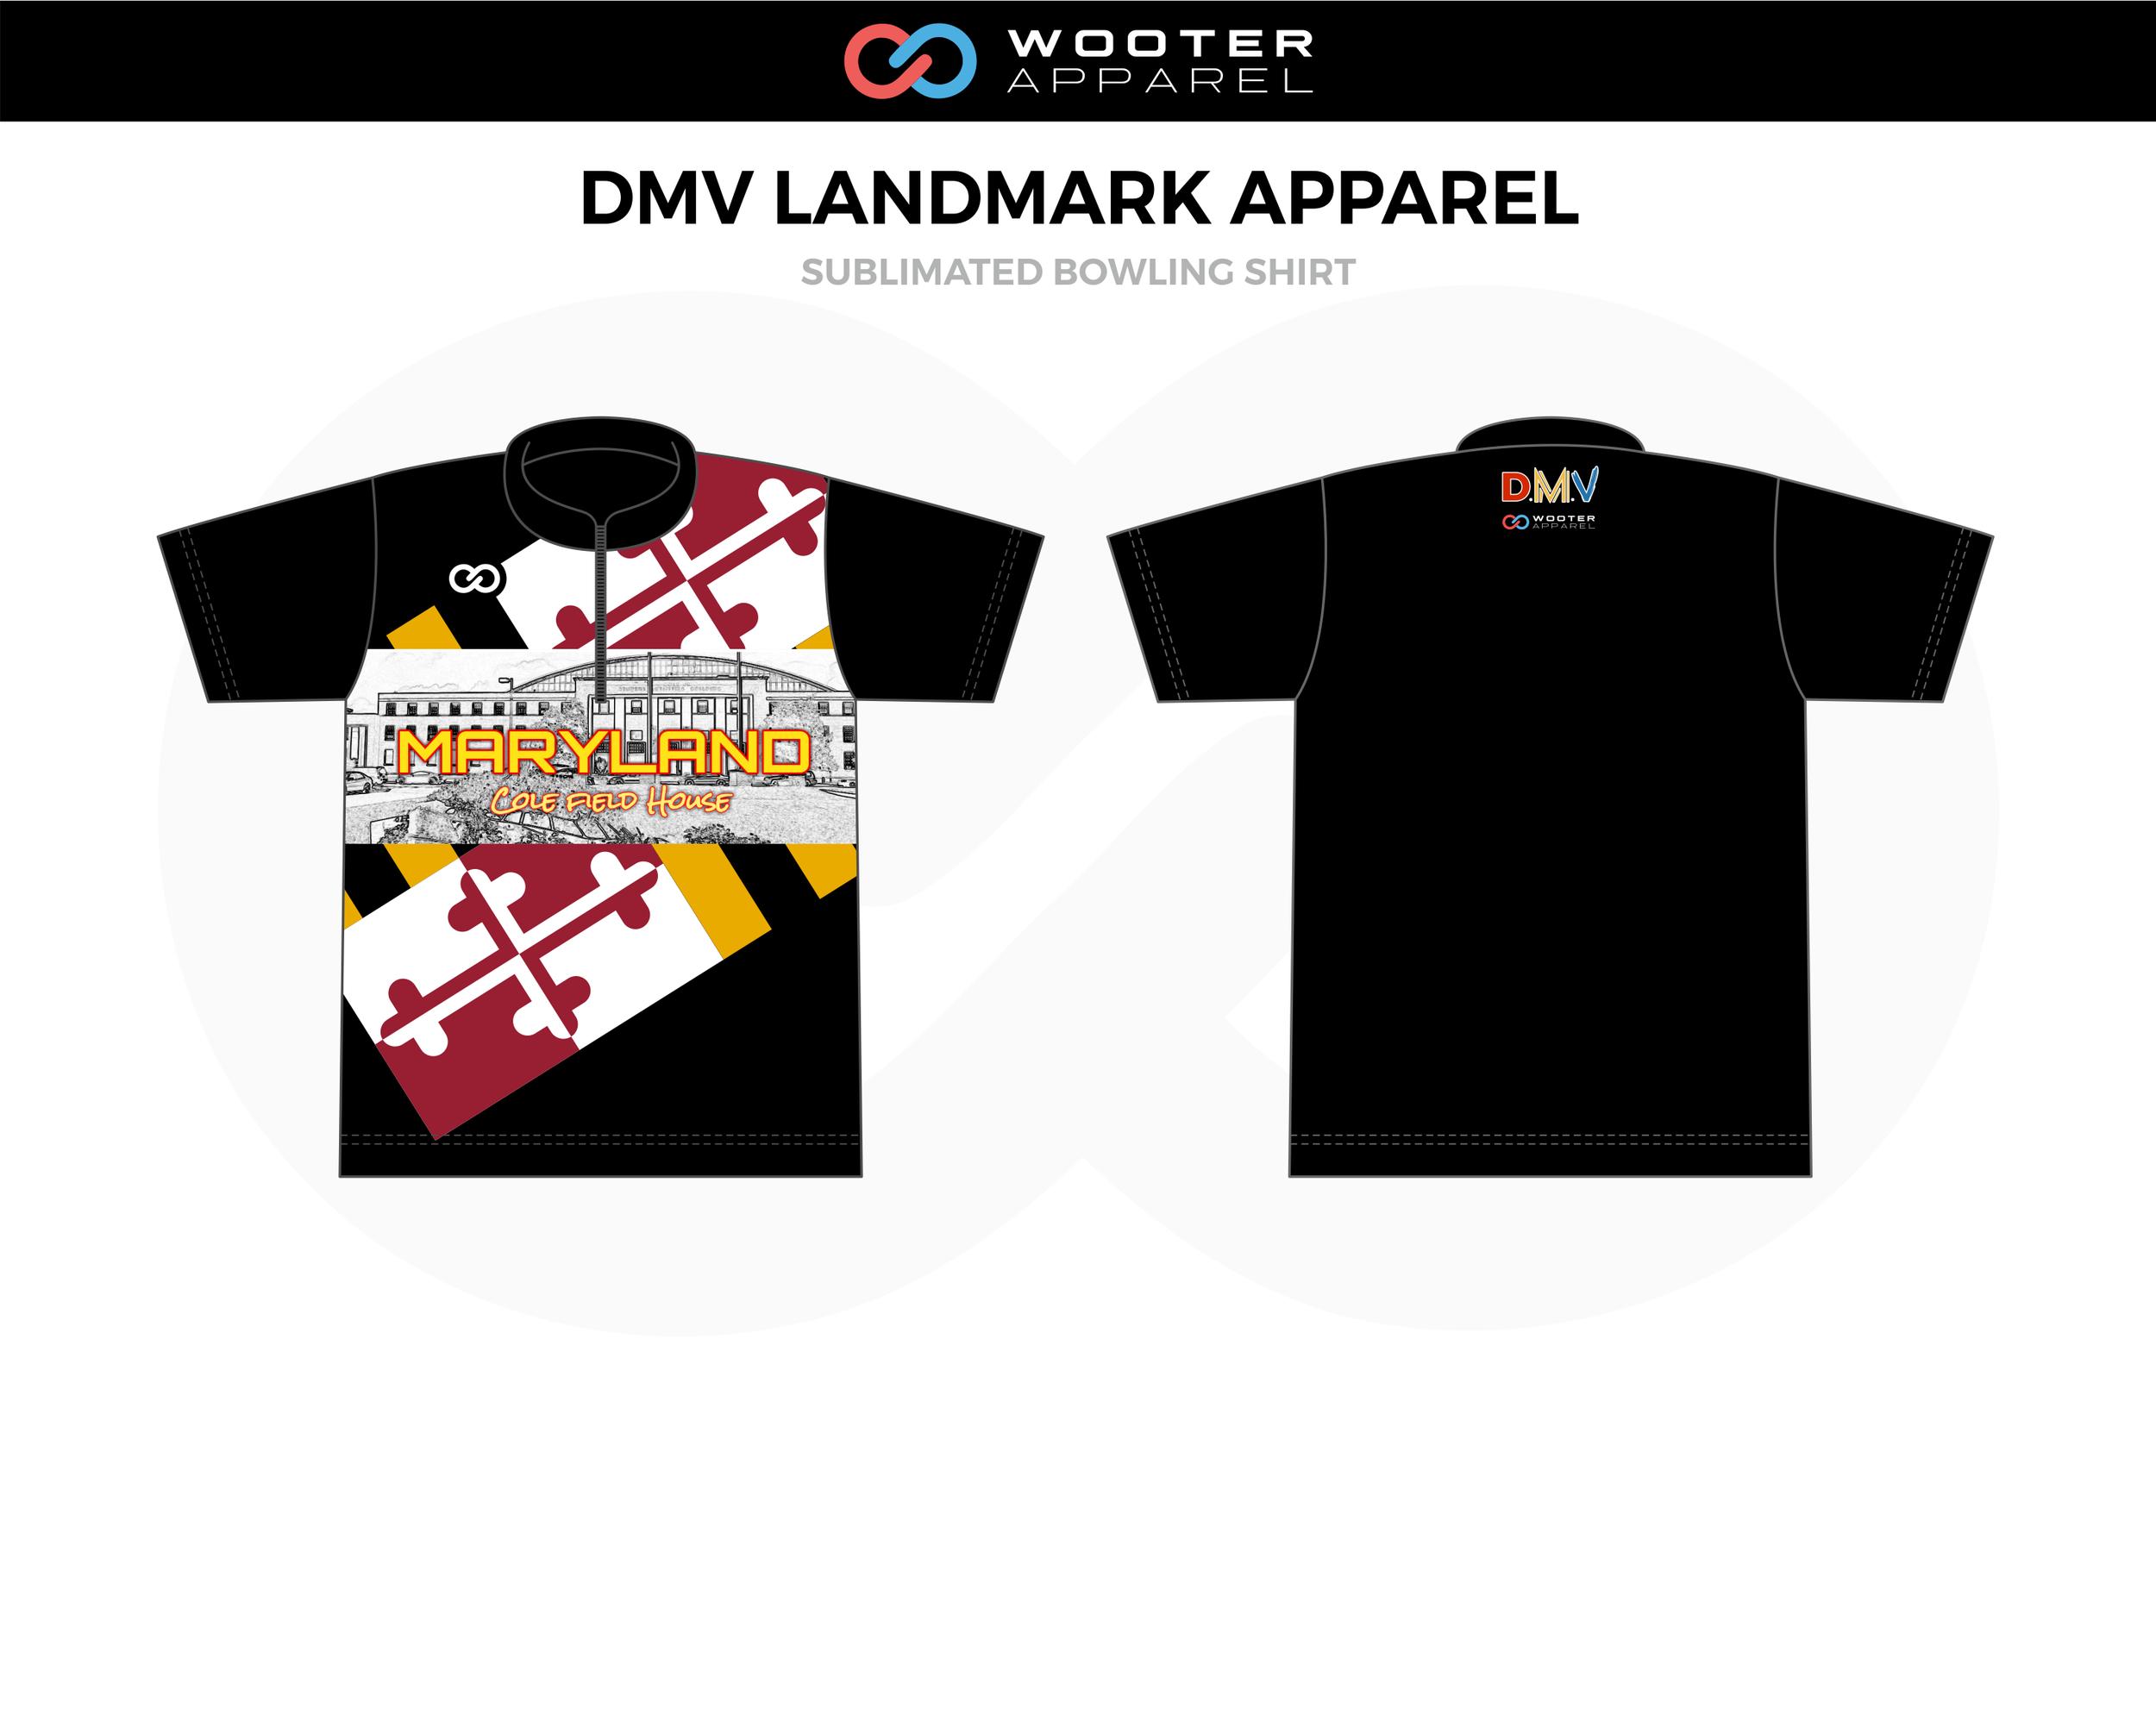 DMV LANDMARK APPAREL White Yellow Red Black Bowling Shirt